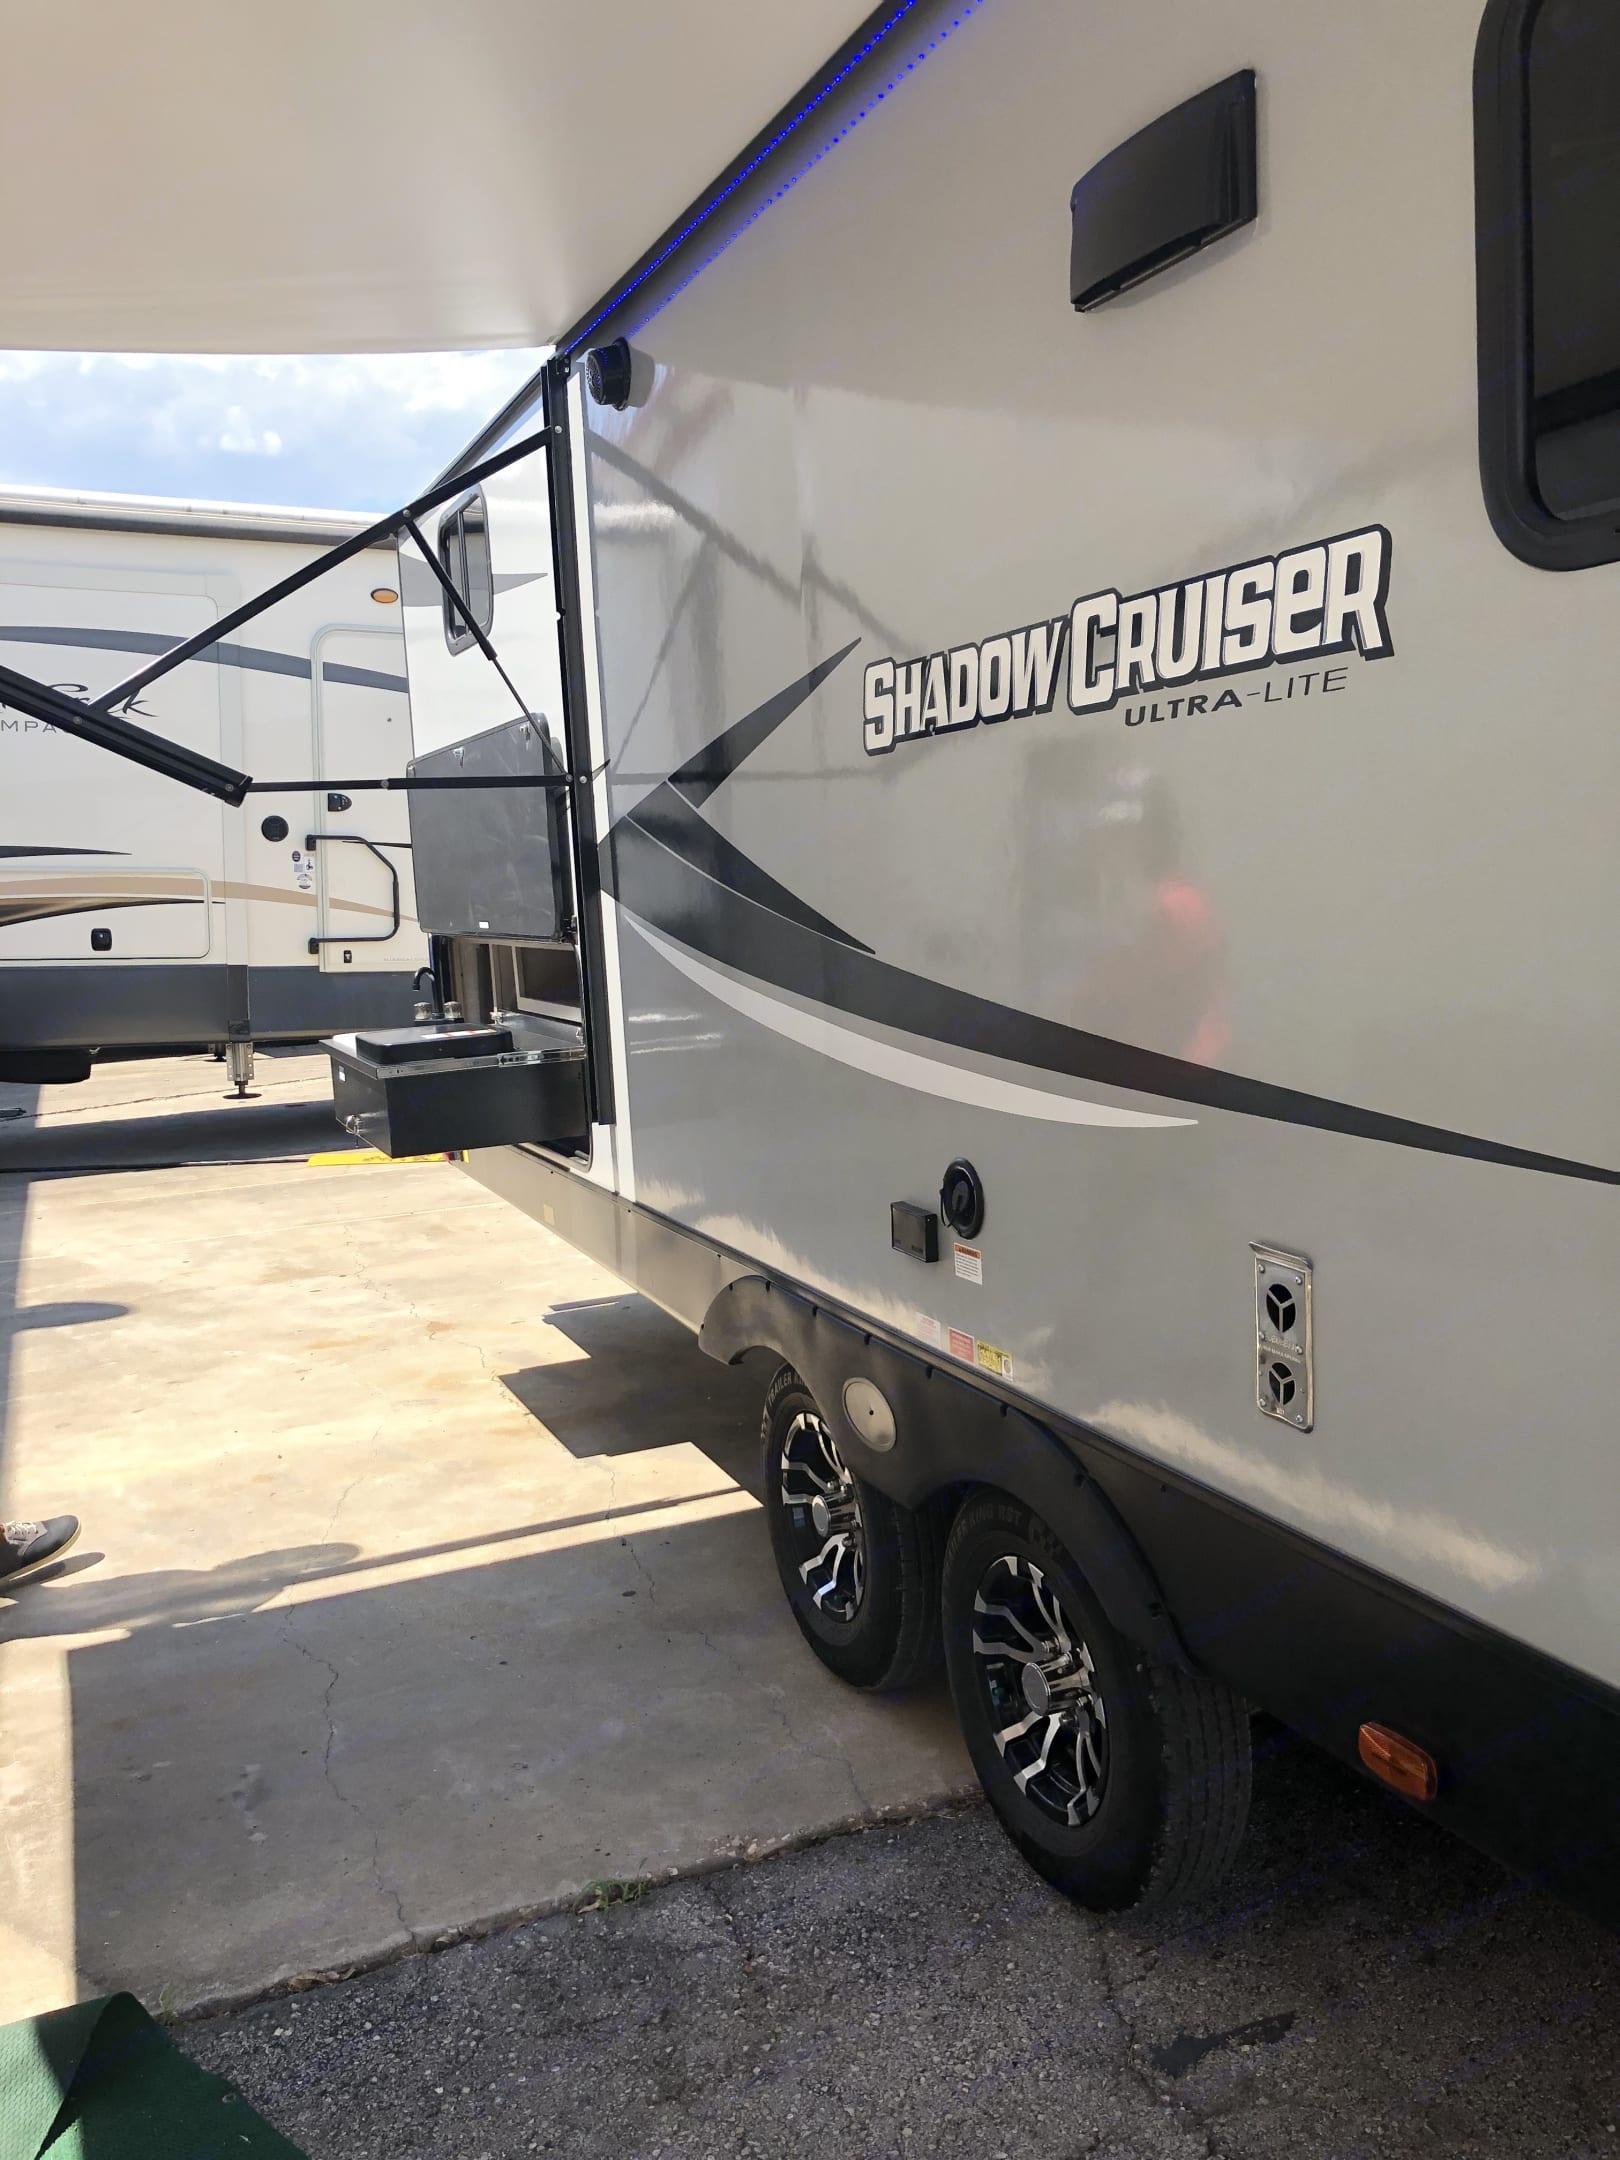 Cruiser Rv Corp Shadow Cruiser 2021